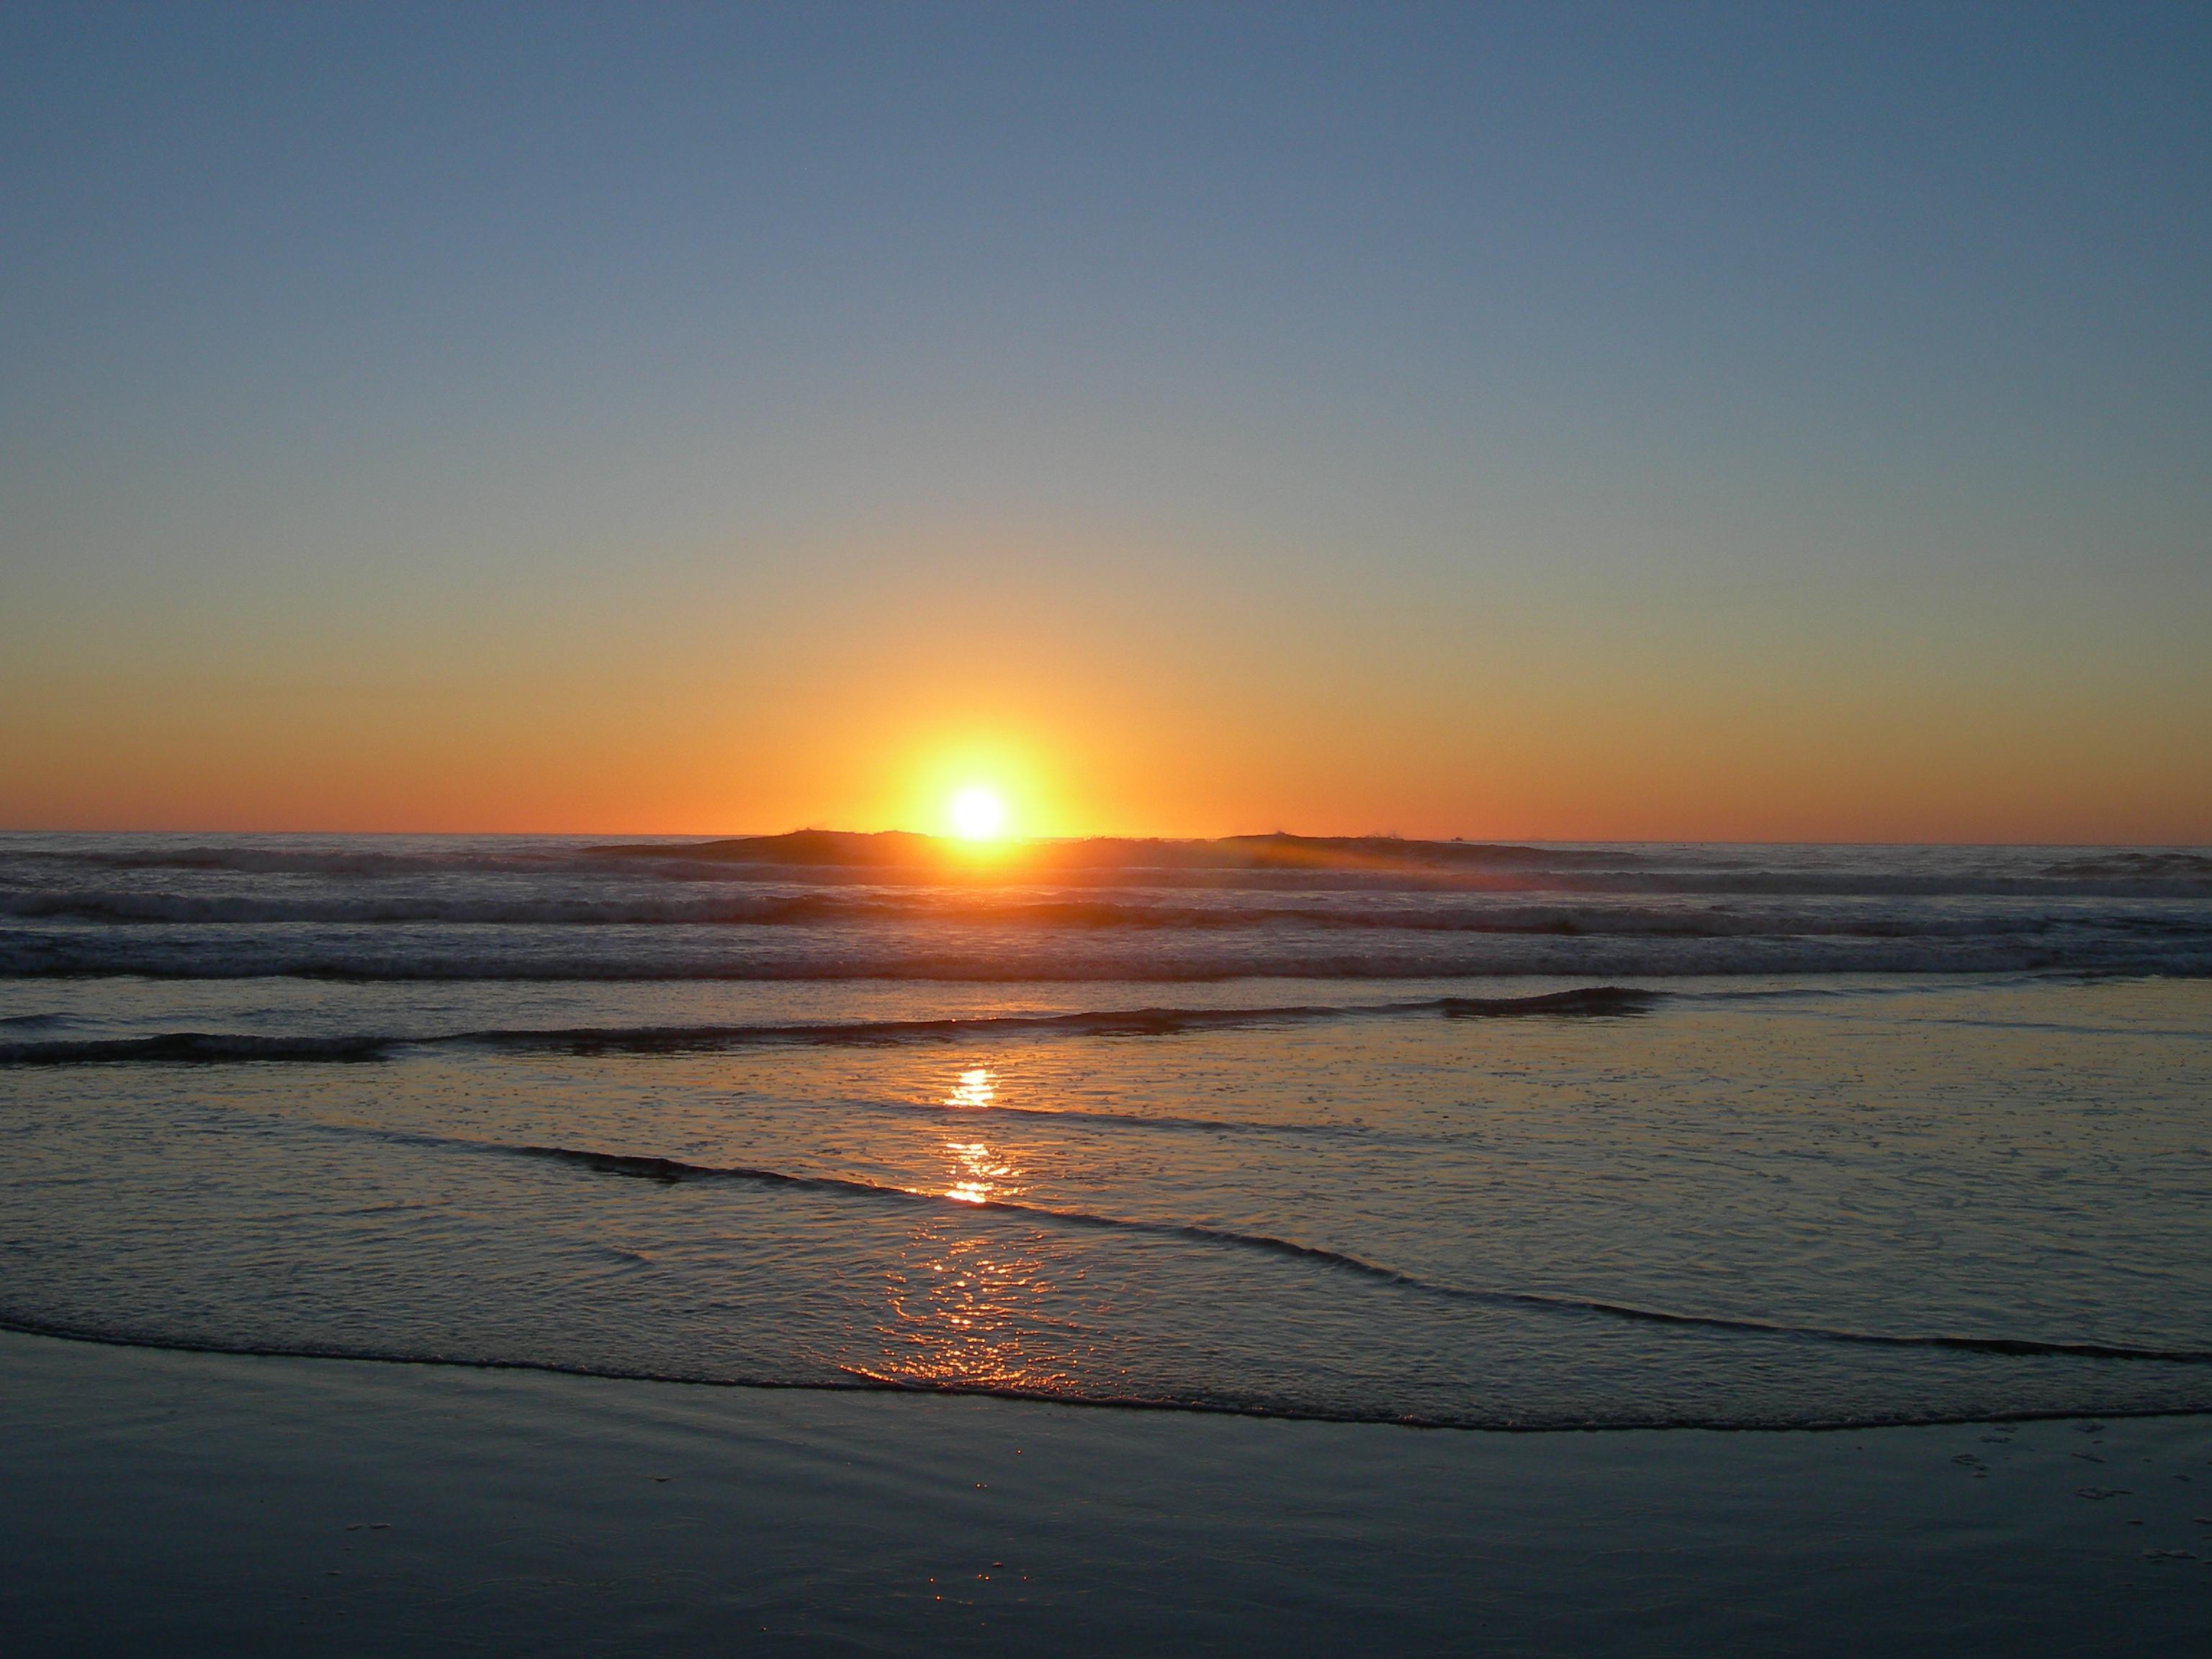 Pacific sunset photo